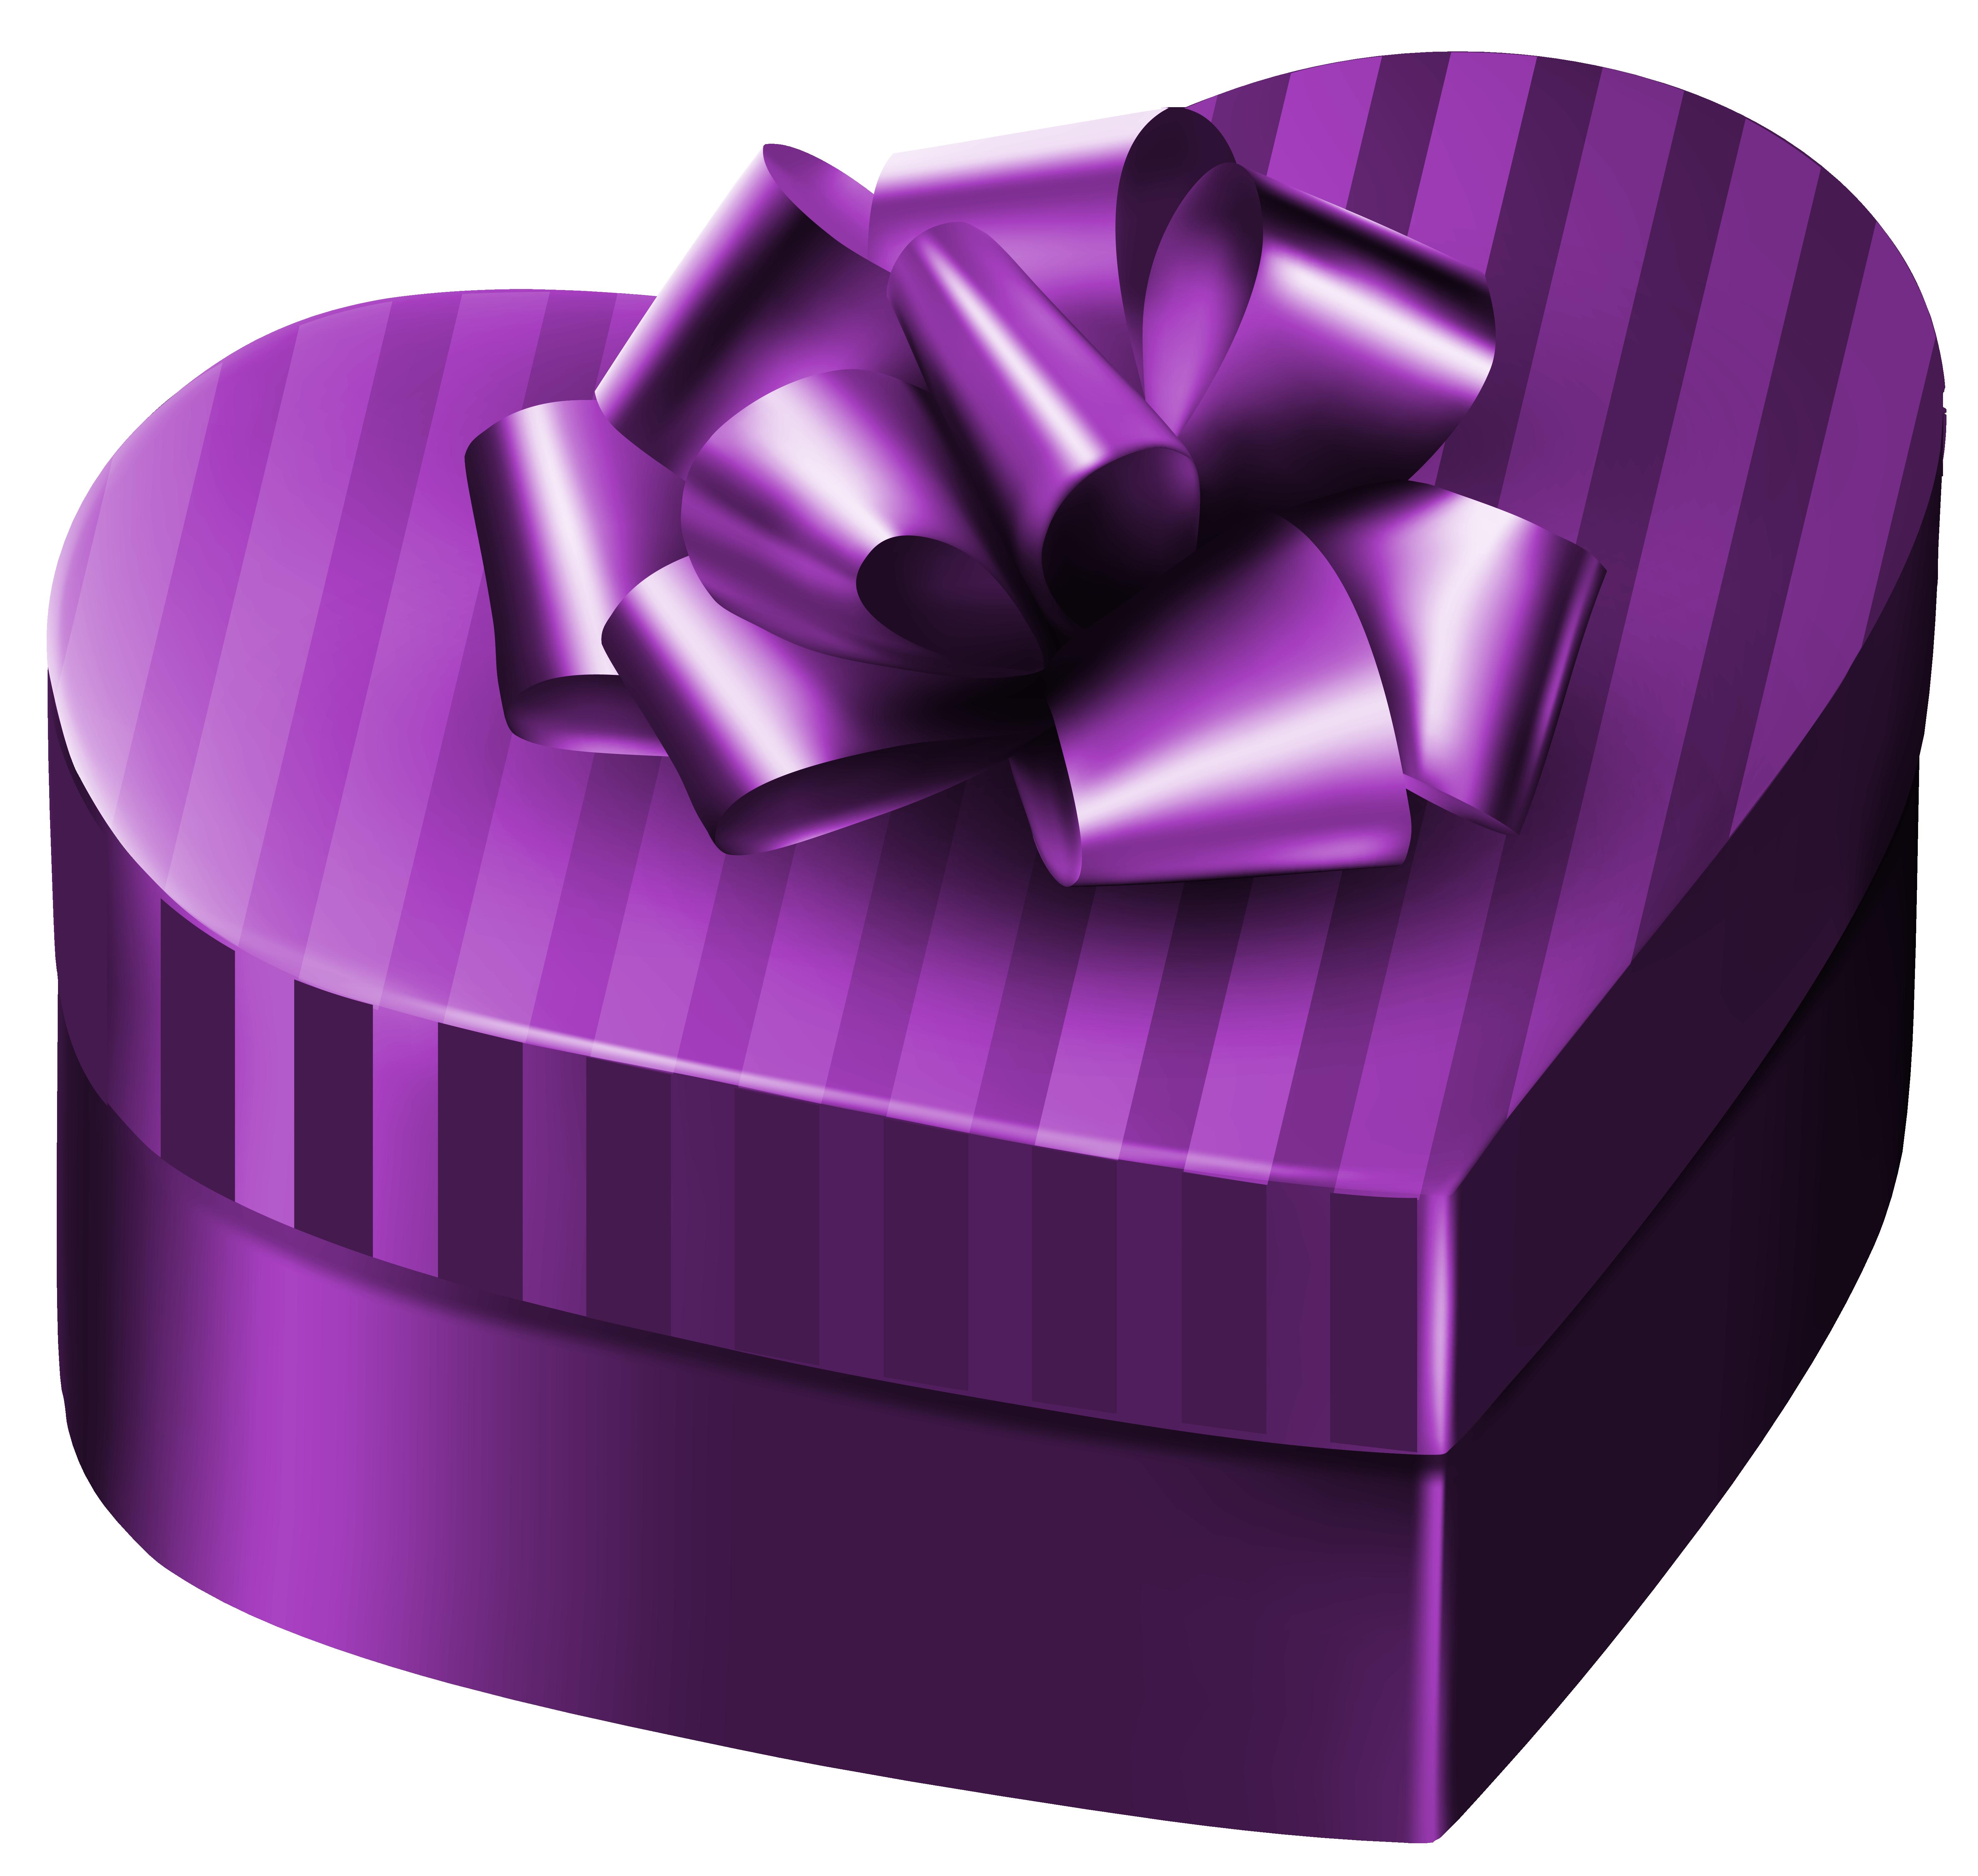 Gift clipart parcel. Purple luxury box heart